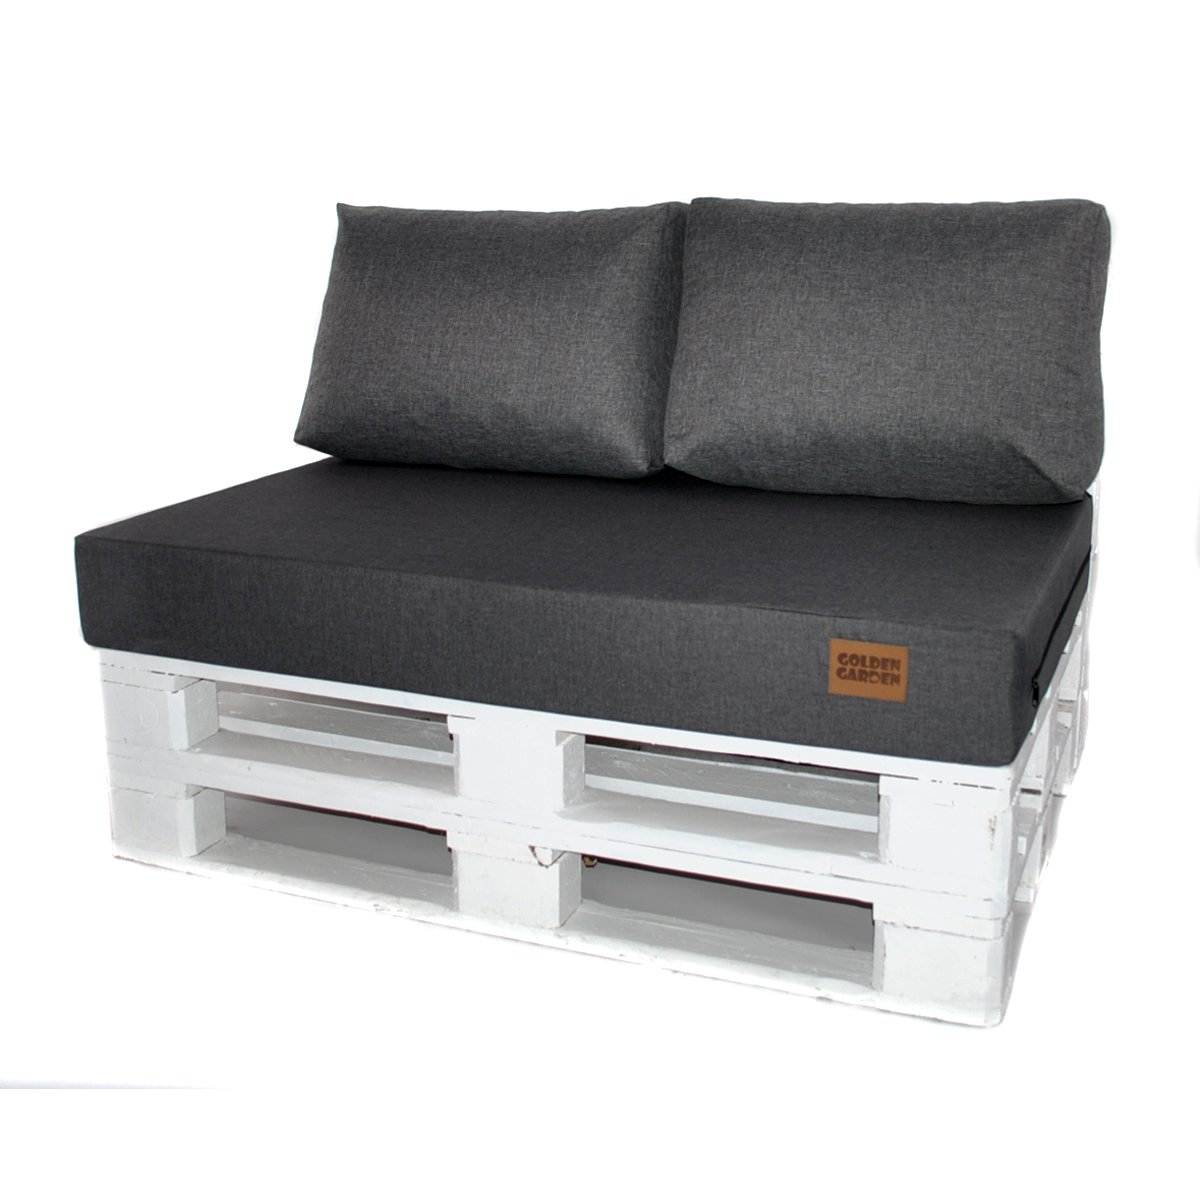 Polster paletten sofa outdoor - Kissen palettenmobel ...